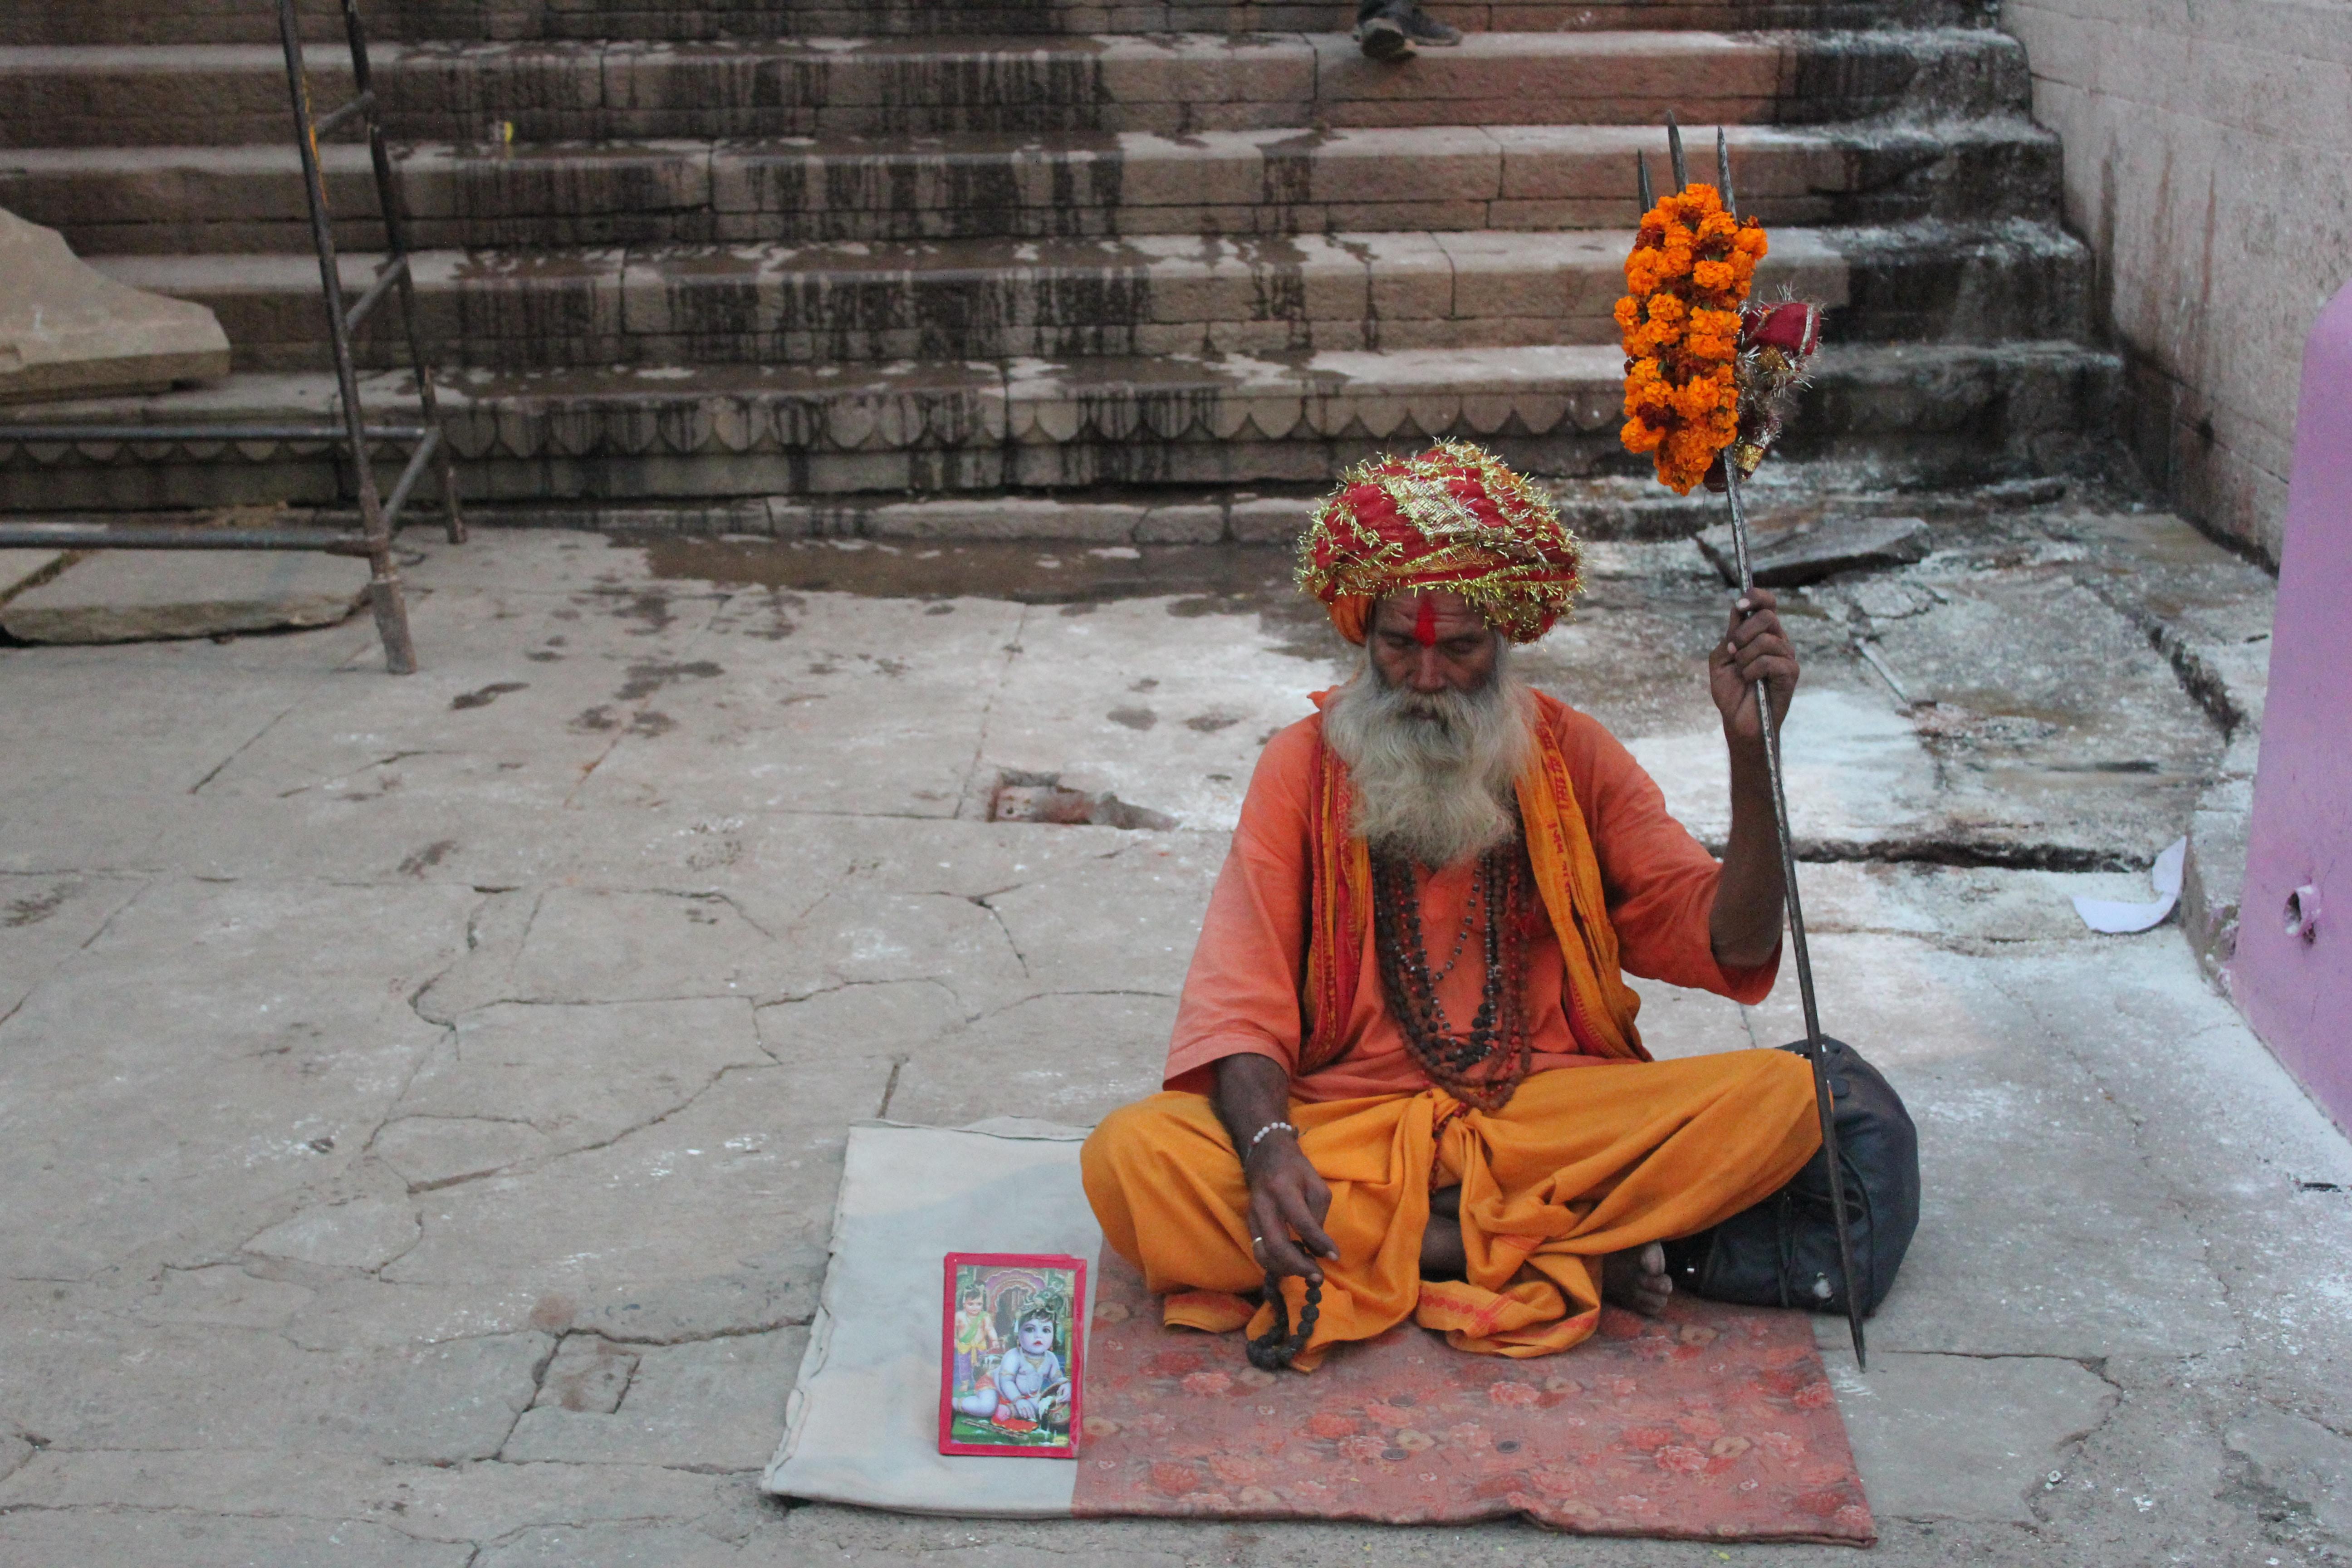 sitting man wearing orange and yellow elbow-sleeved shirt holding staff